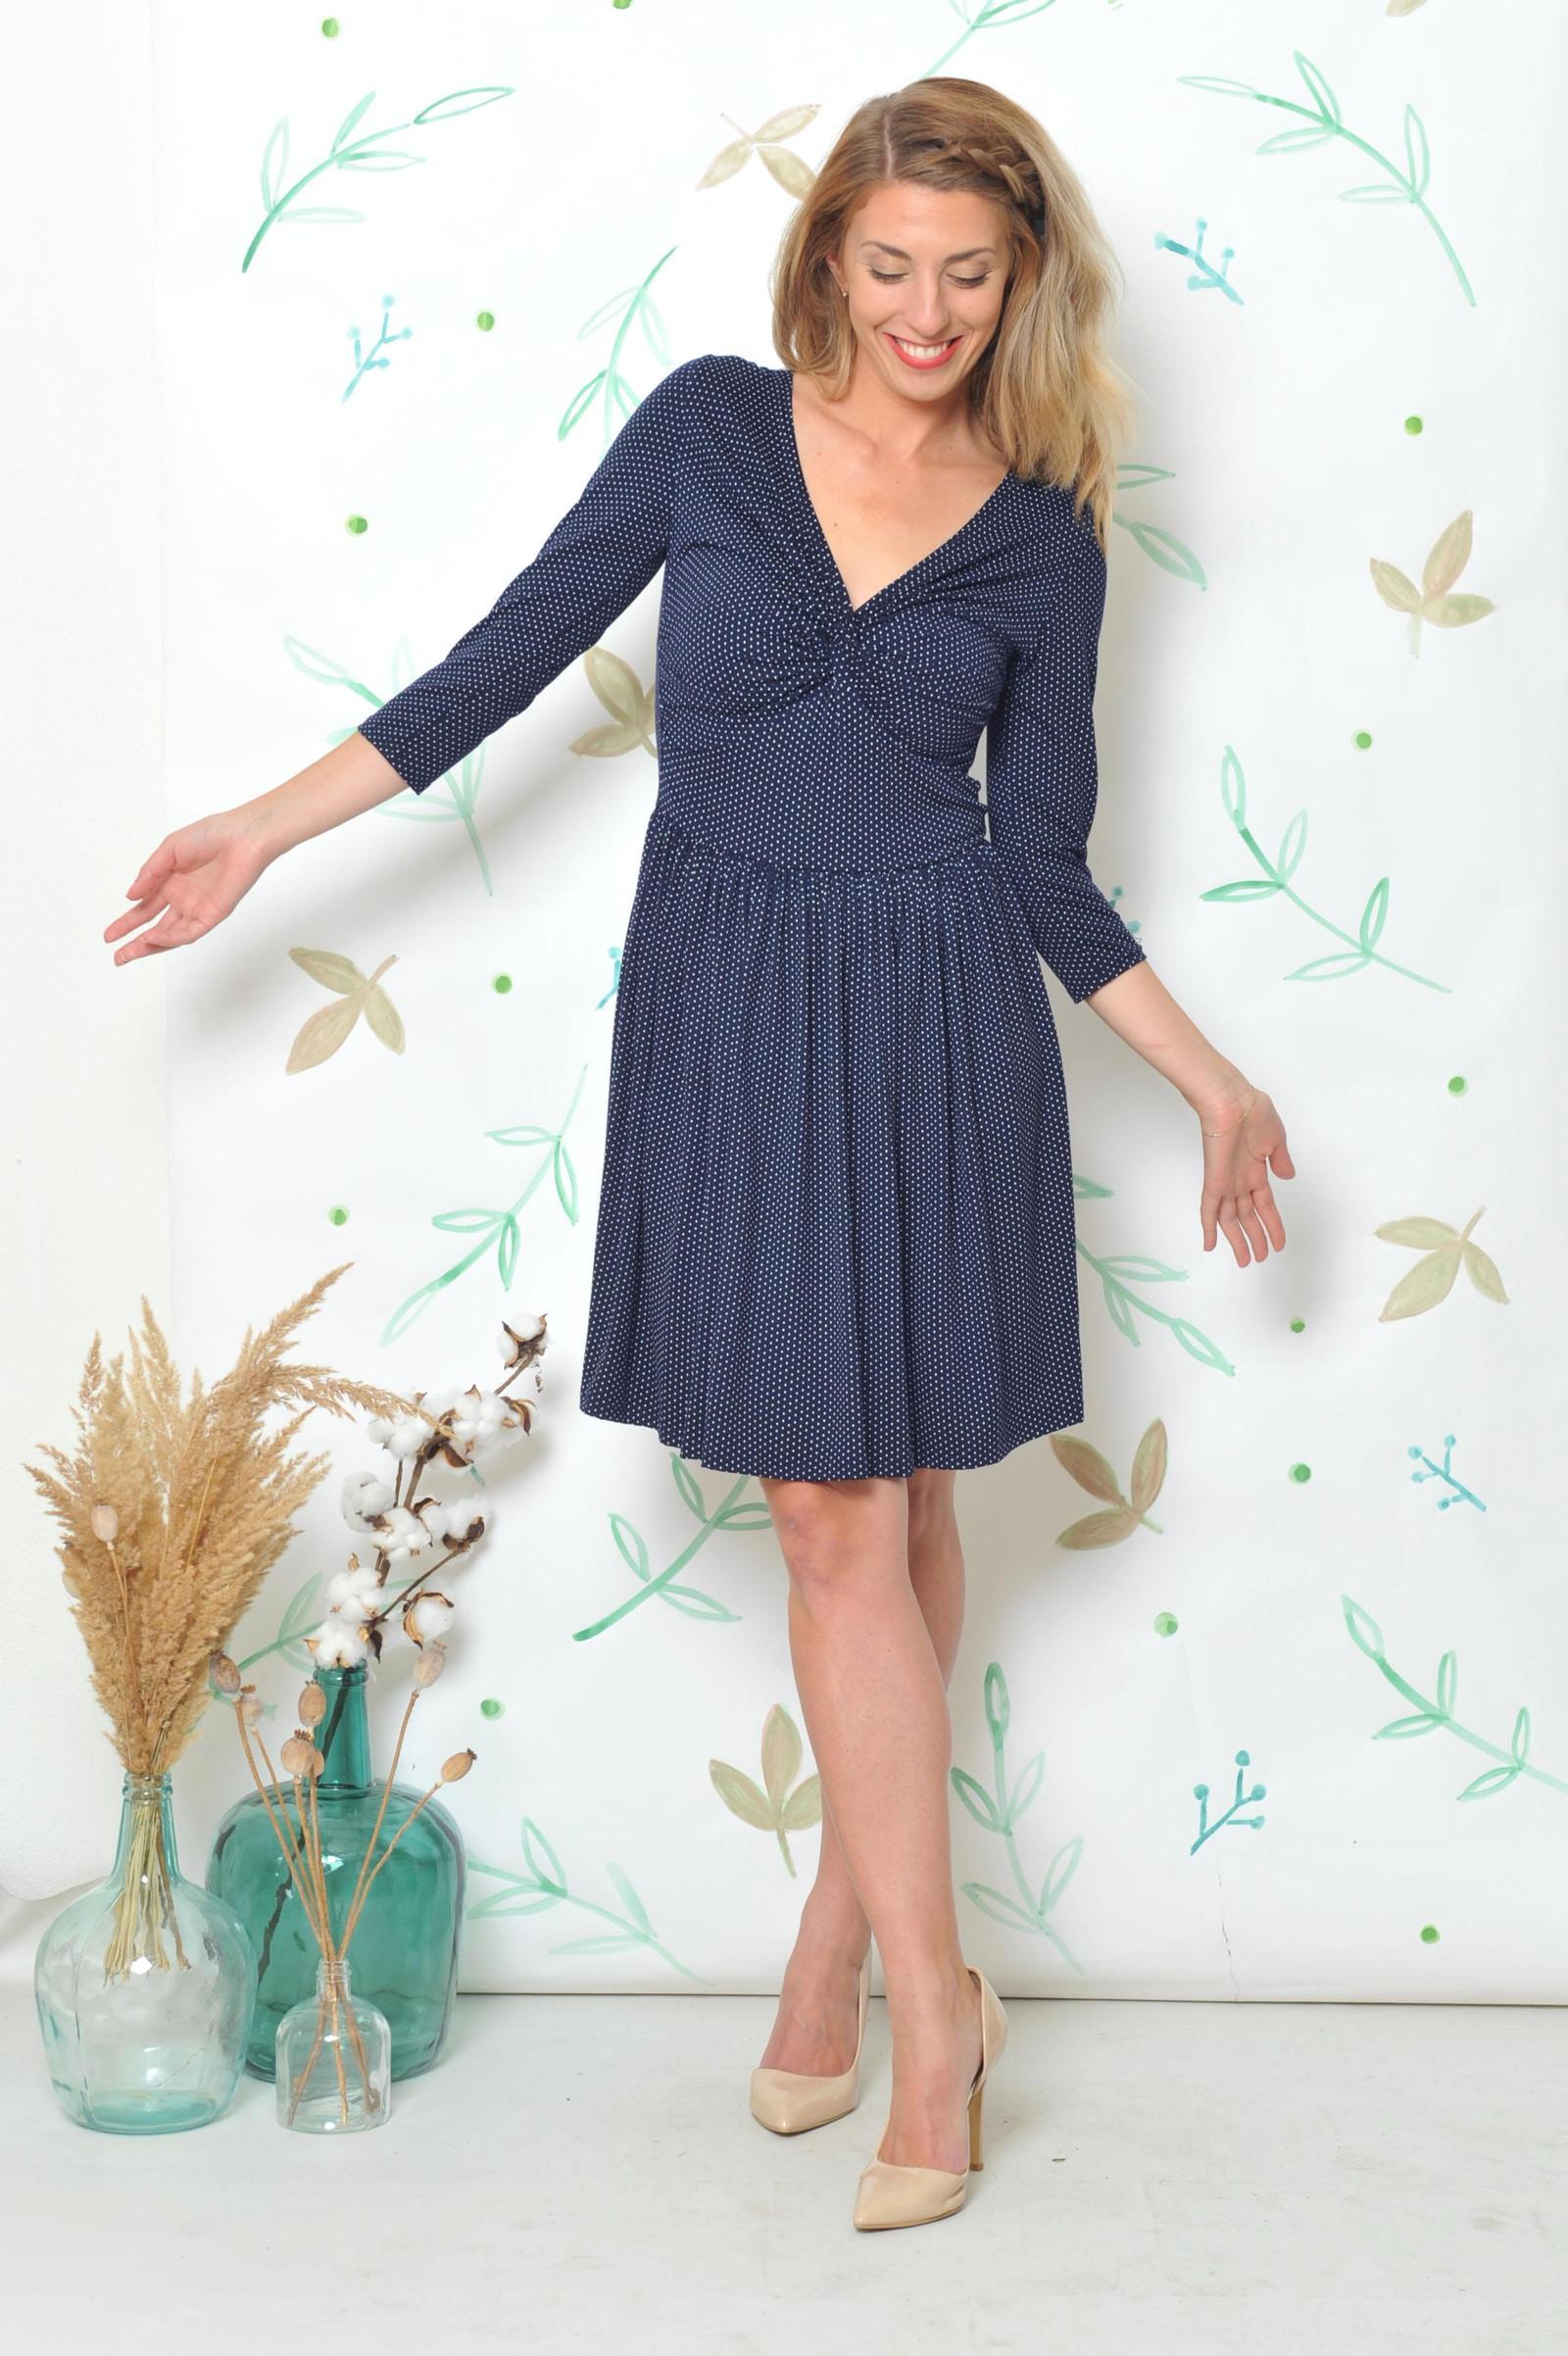 Krátké šaty Anett Princess - puntík 9c4117d4a6